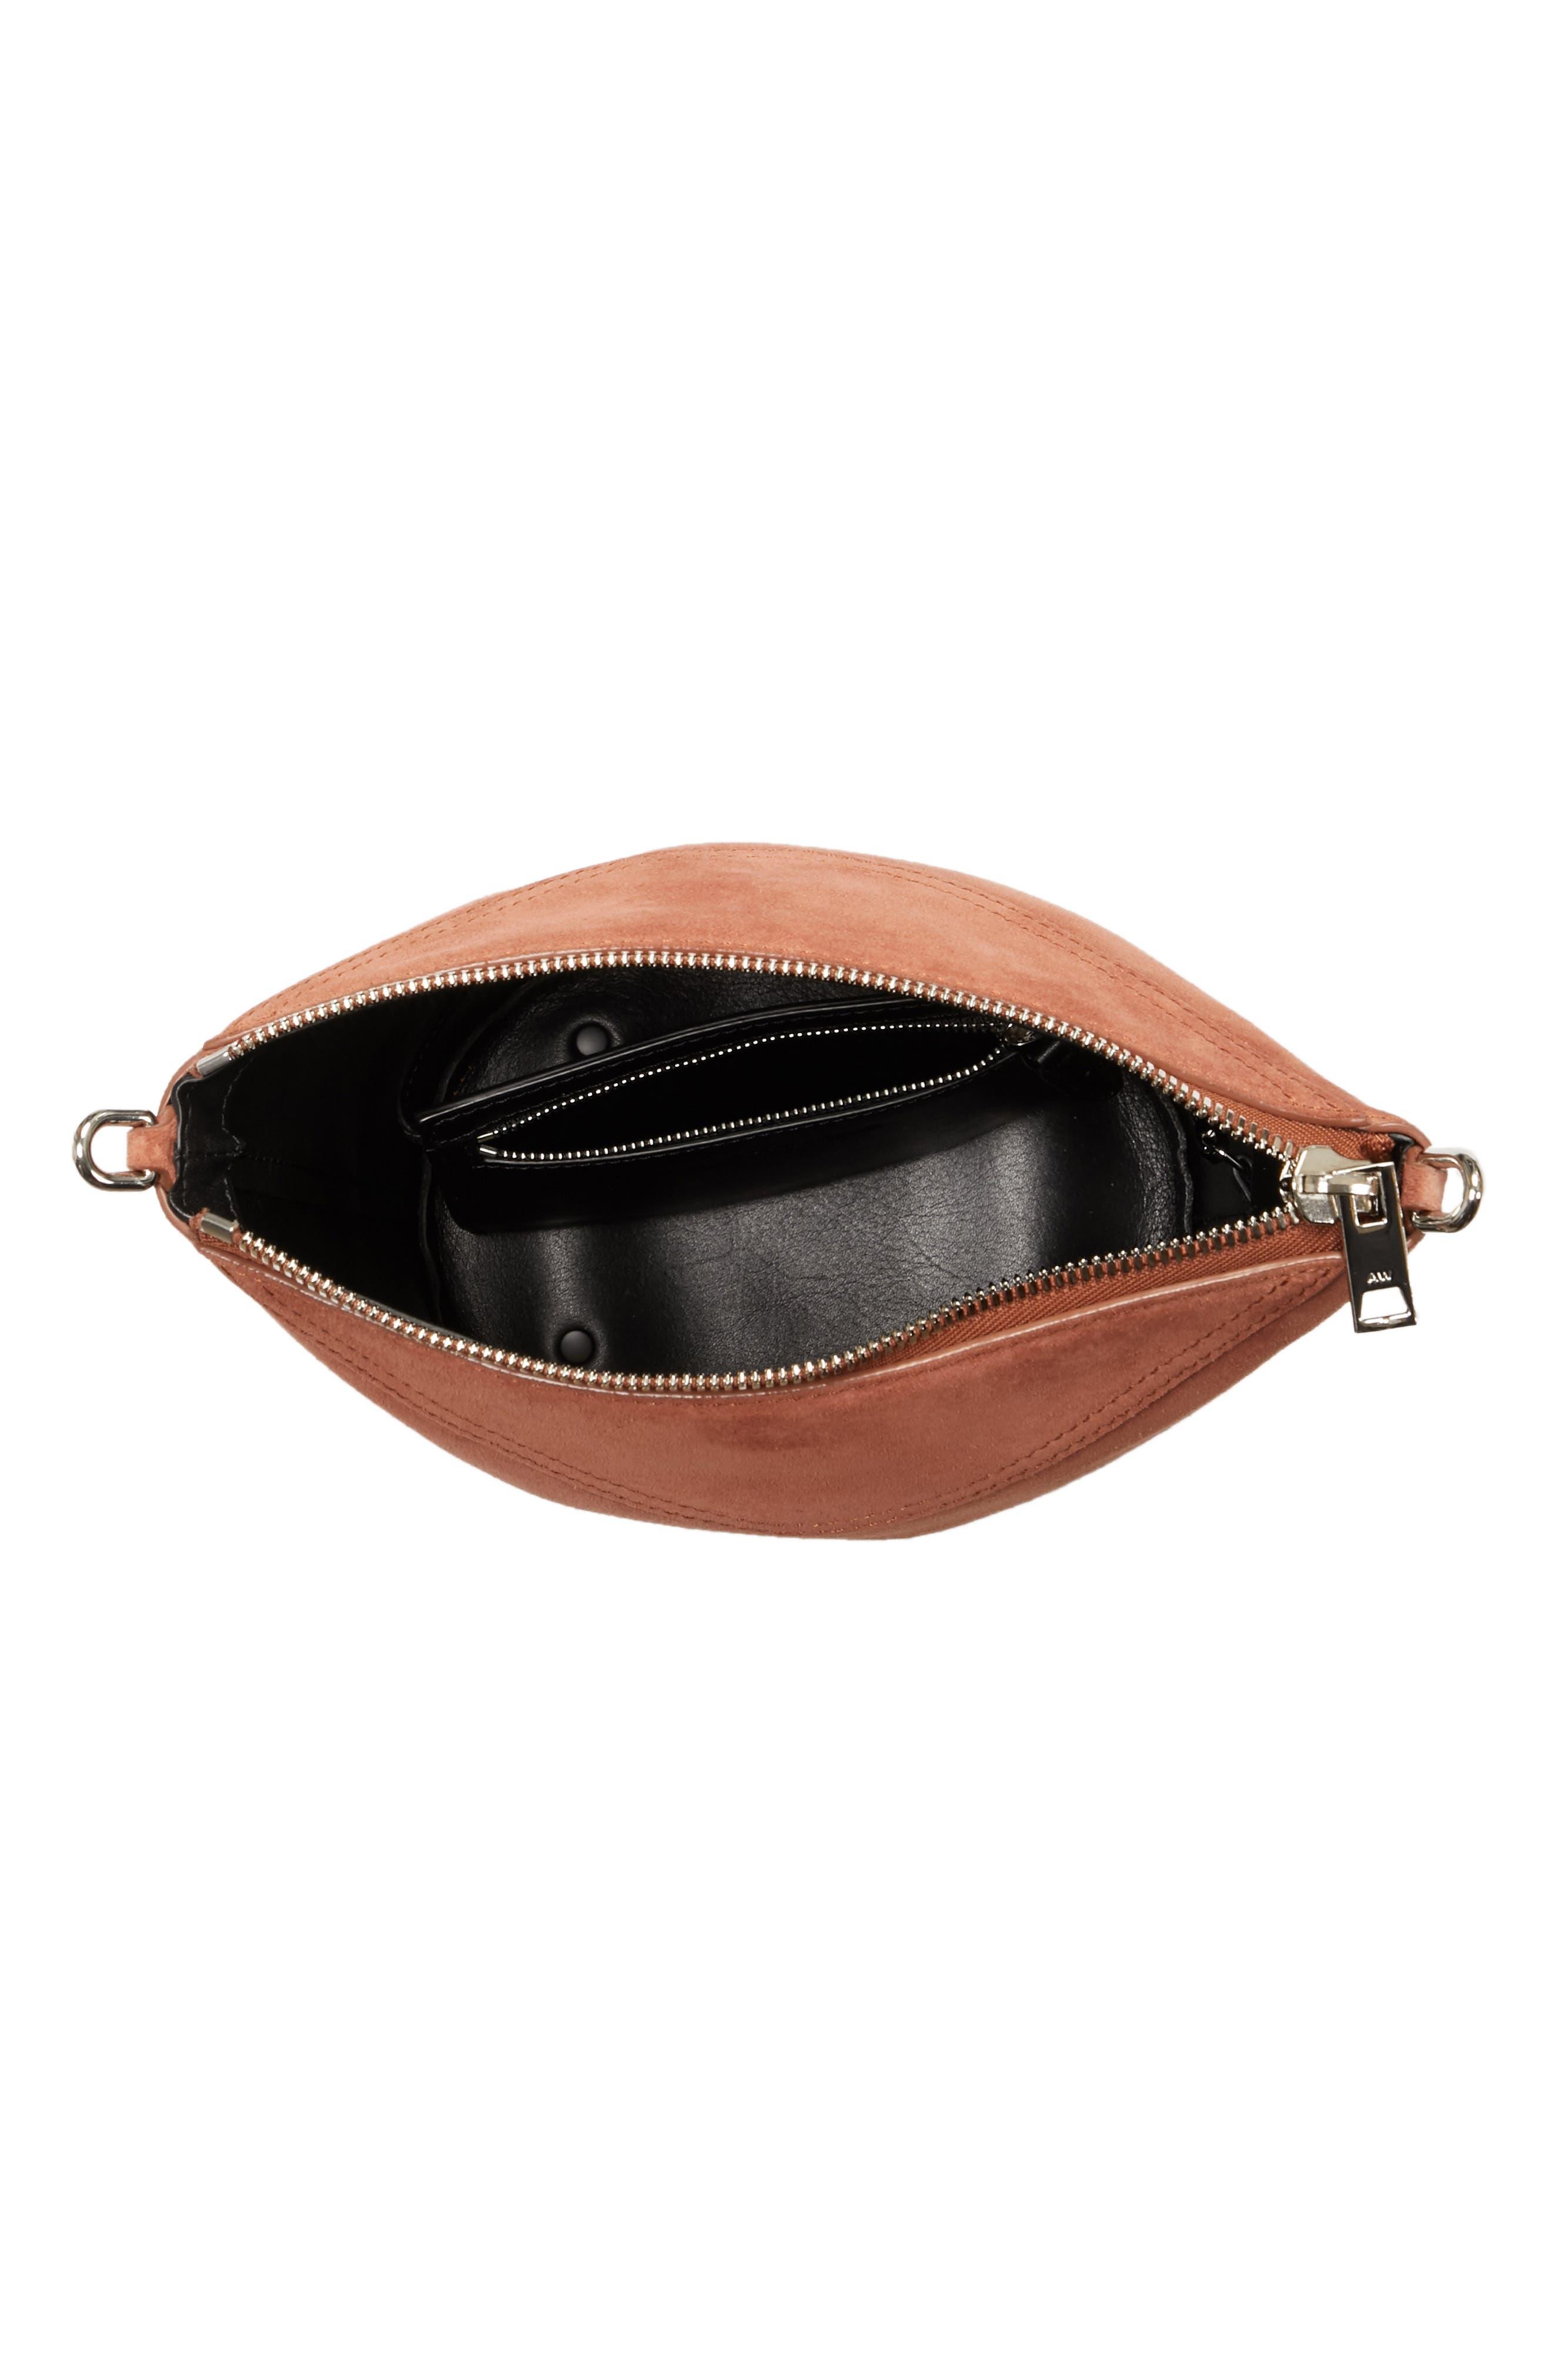 Ace Suede Bucket Bag,                             Alternate thumbnail 4, color,                             Terracotta